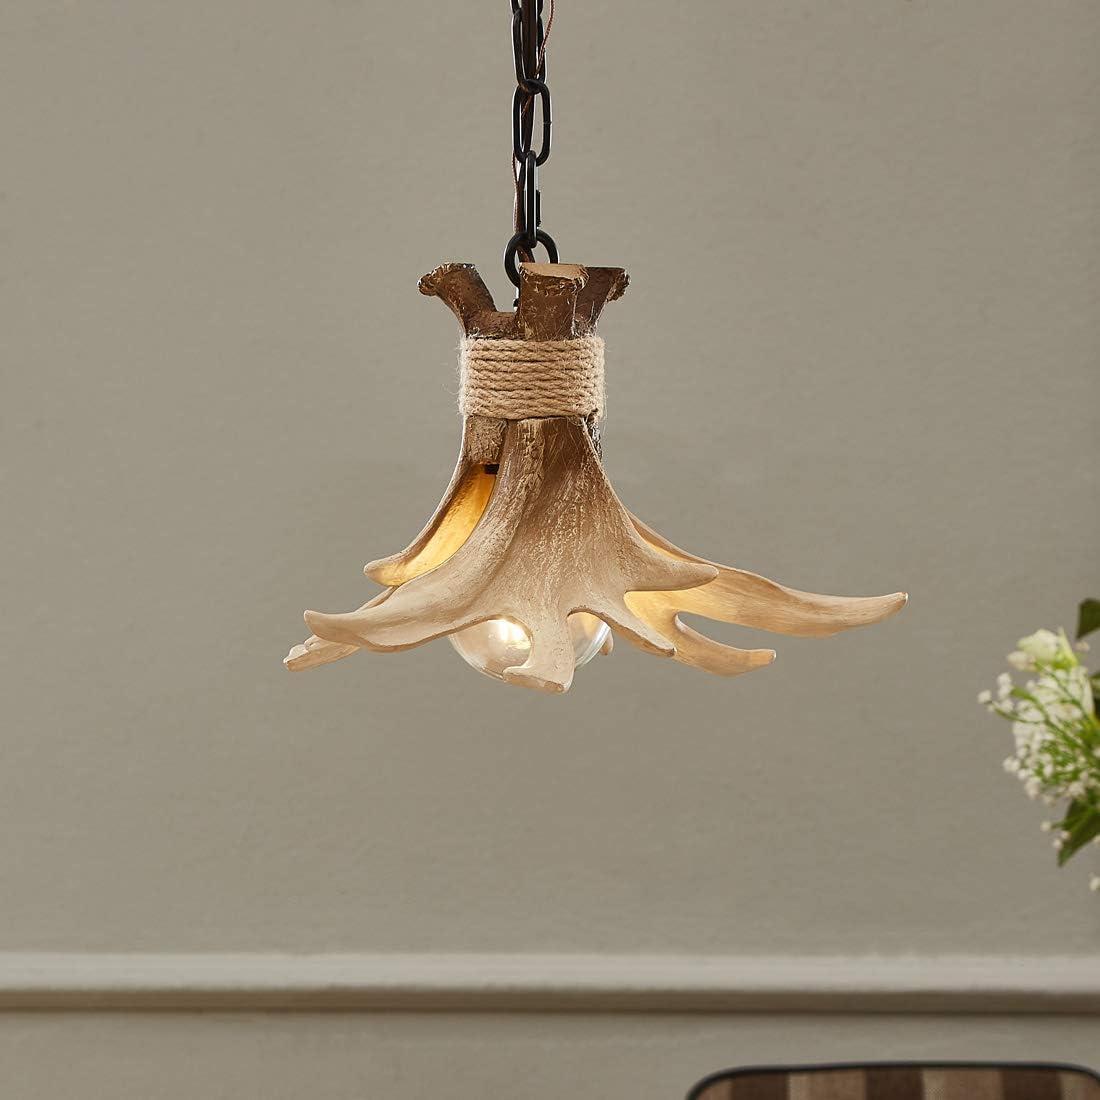 Mini Antler Pendant Light for Kitchen Island Dining Room Bathroom,1-Light Small Faux Resin Anter Decor Chandelier Ceiling Lamp,Brown BN-1016